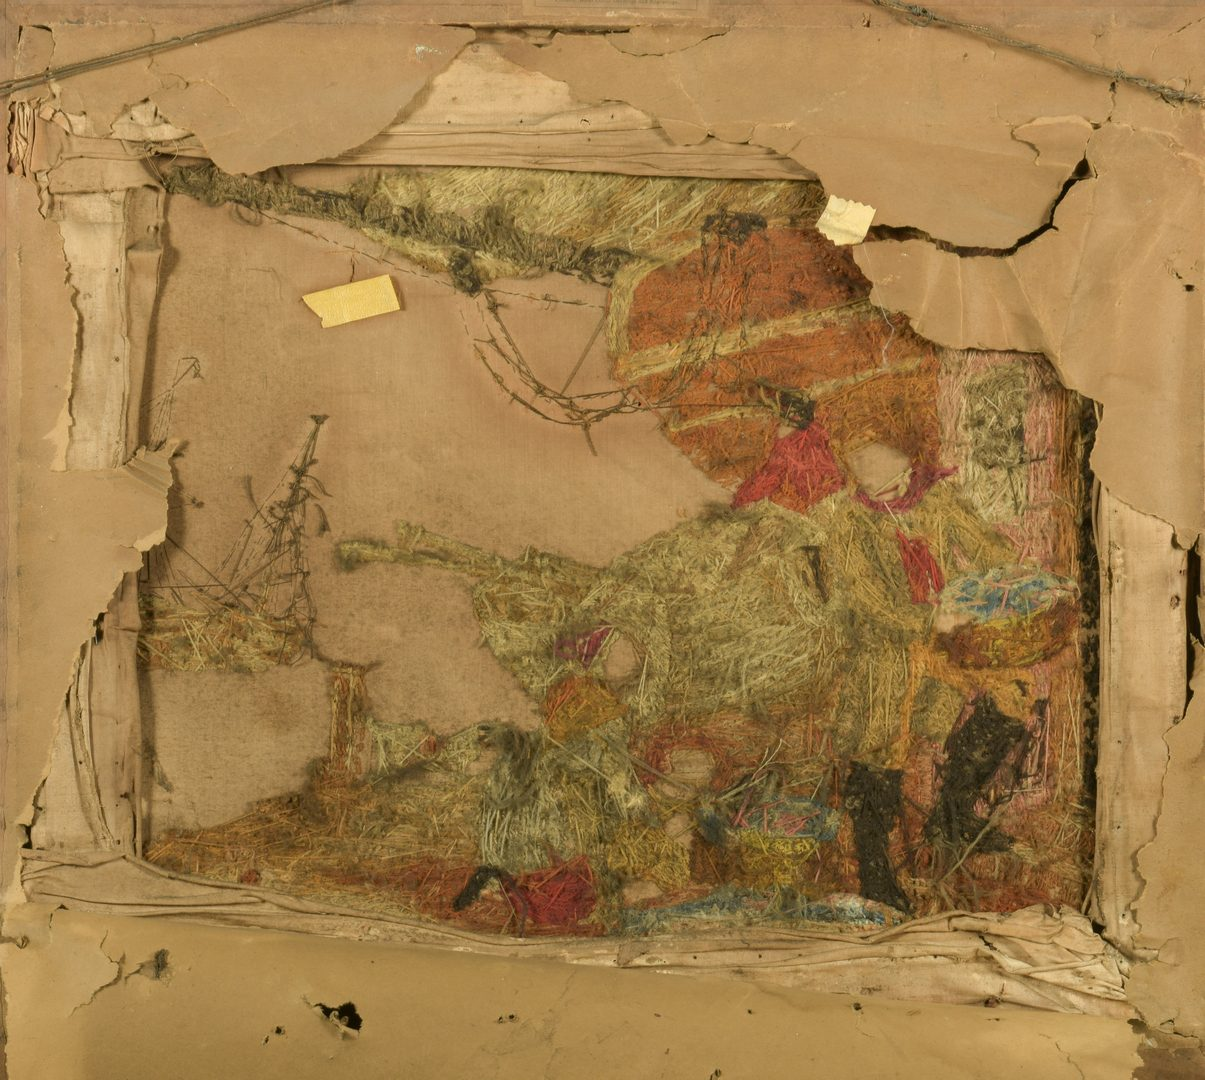 Lot 121: English Marine Embroidery, Seaport Scene